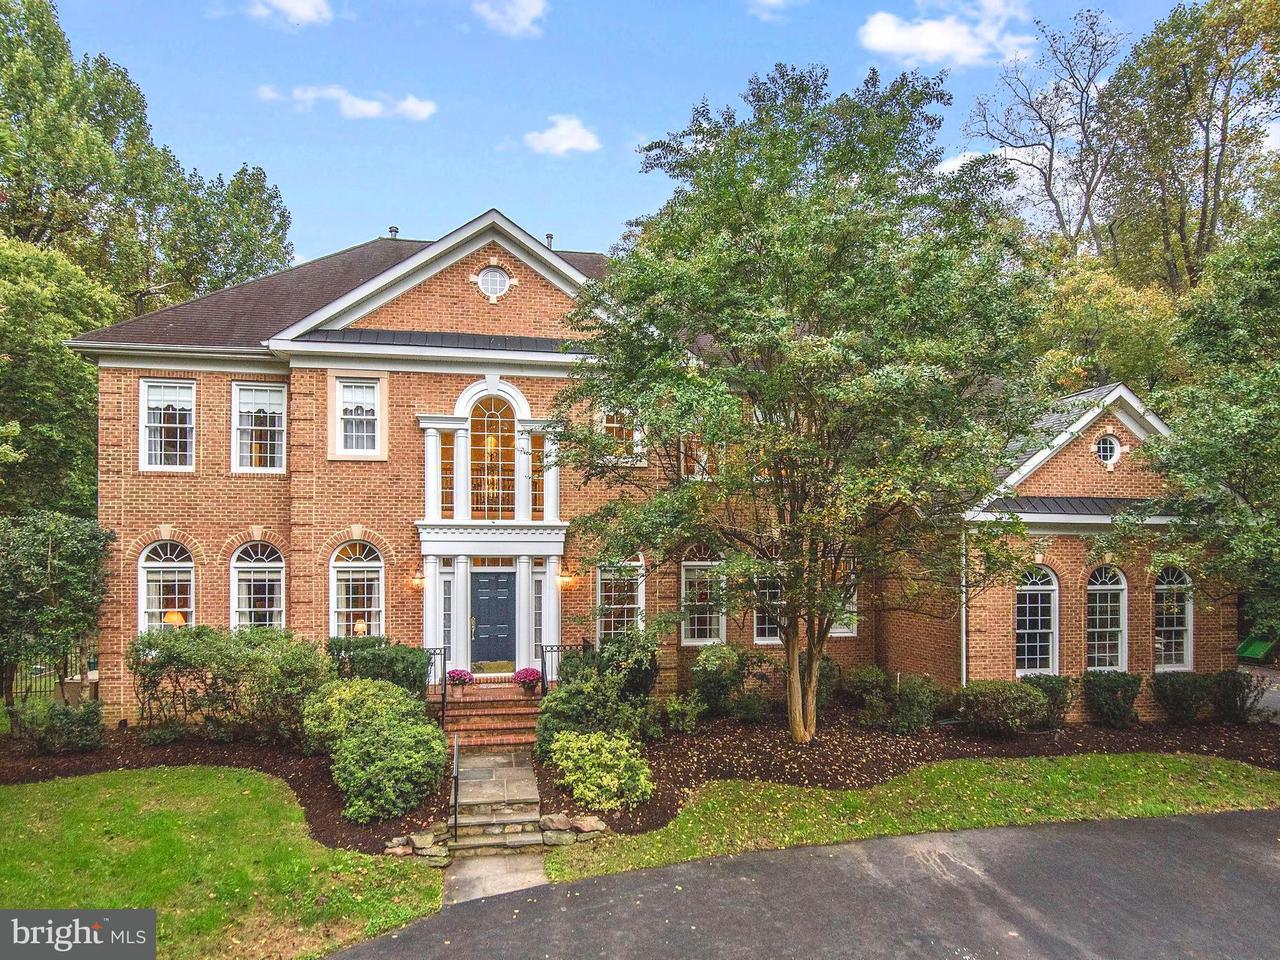 獨棟家庭住宅 為 出售 在 15410 RIVER Road 15410 RIVER Road Germantown, 馬里蘭州 20874 美國